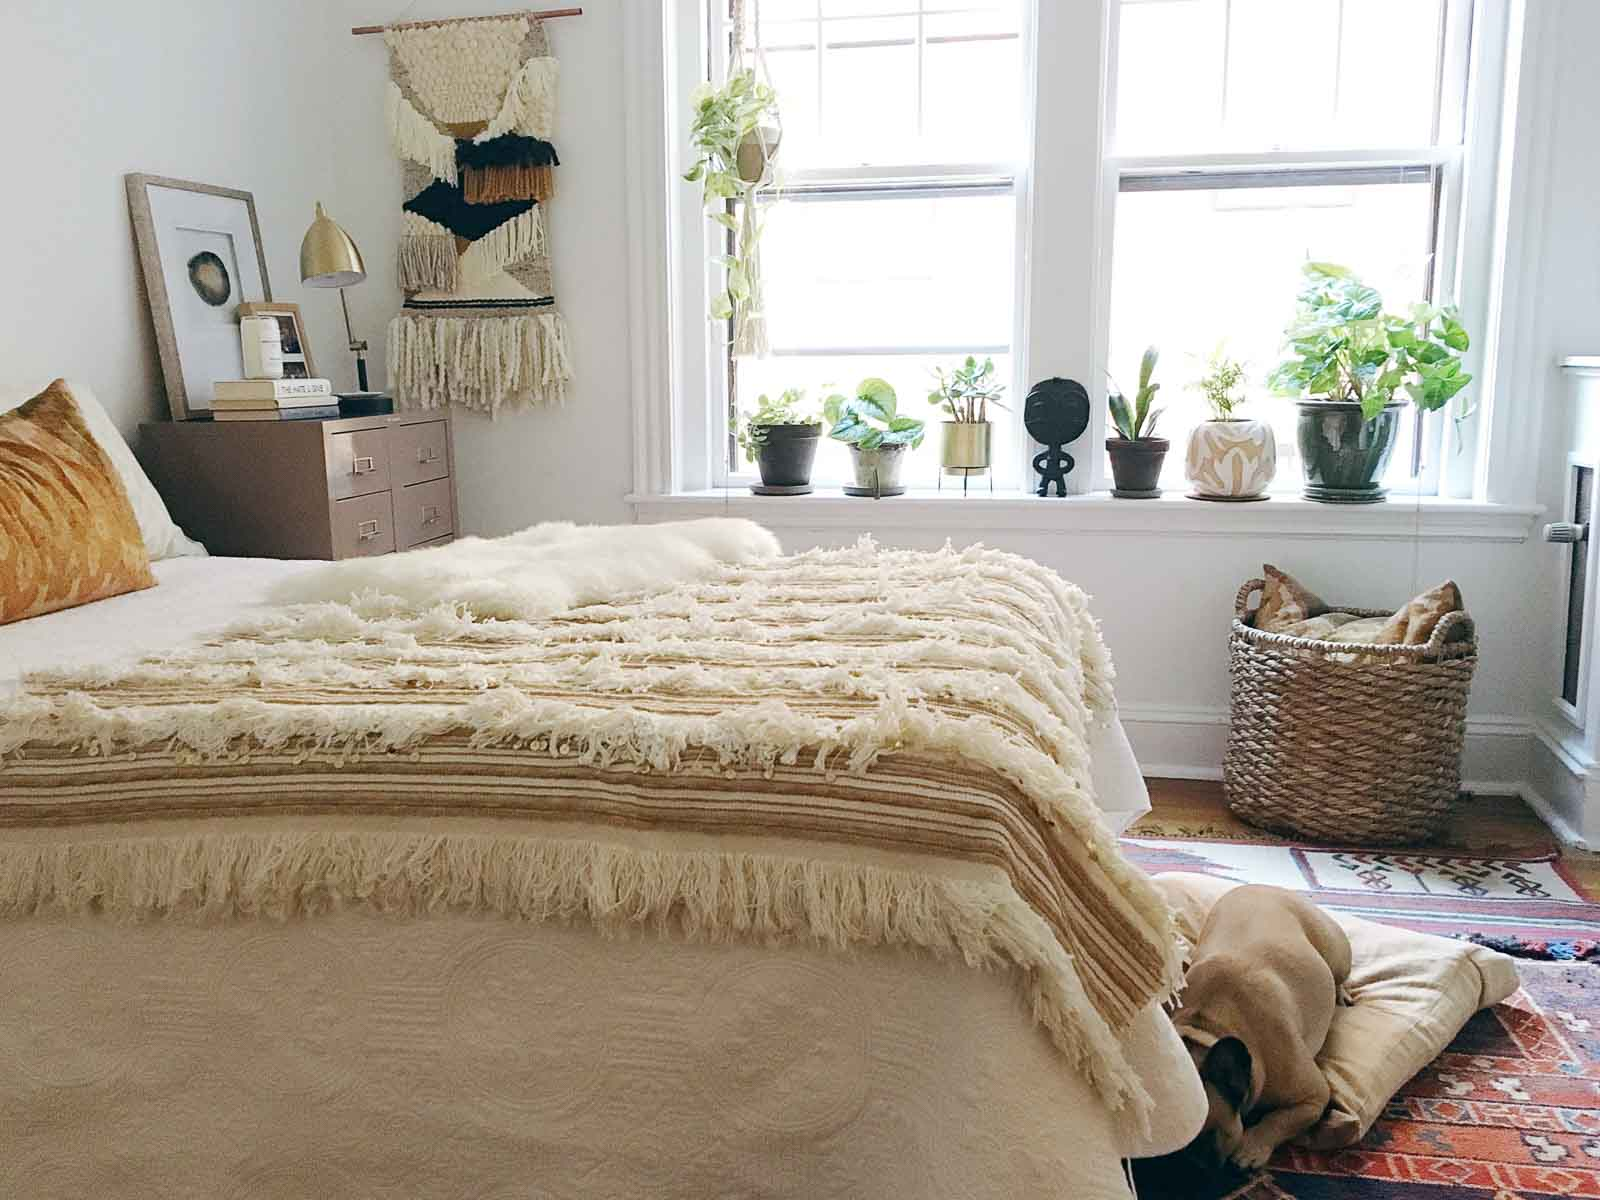 Boho-Charm-michigan-natural-light-photography-studio-lifestyle-photo-ideas-indoor-photoshoot-location-4.jpg